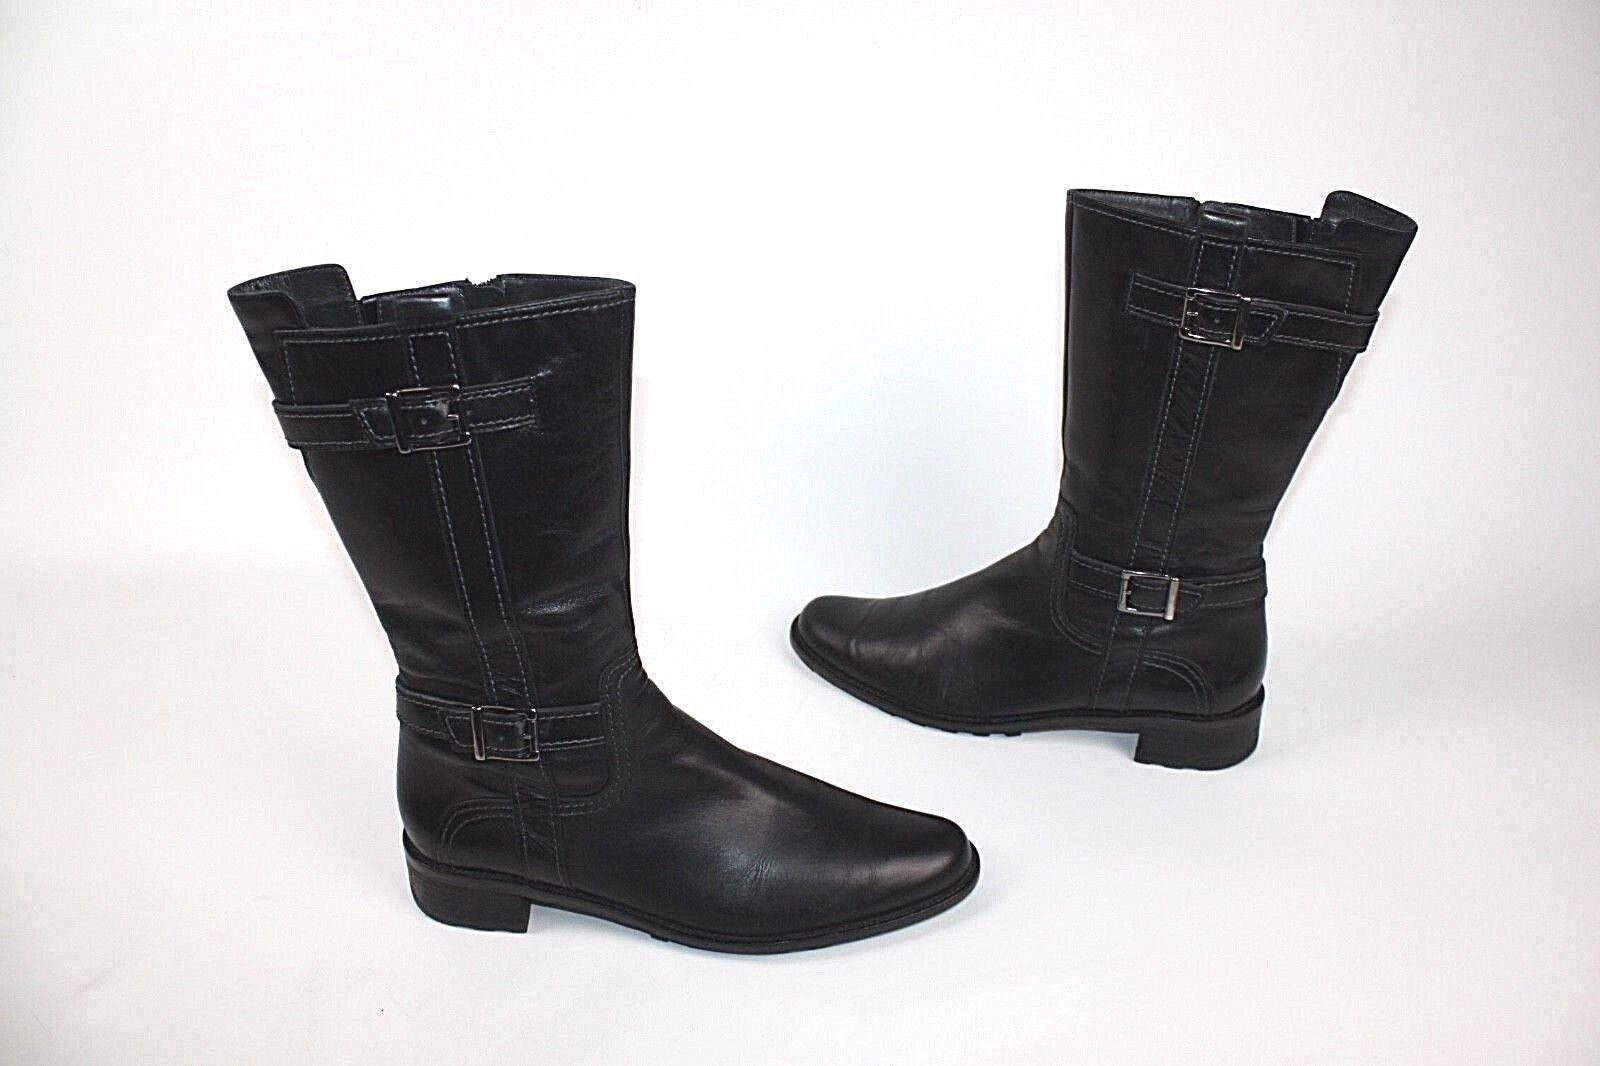 Zapatos especiales con descuento PAUL GREEN ! DAMENSTIEFEL STIEFELETTEN SCHWARZ 6 1/2 ECHTLEDER  #24911 07#